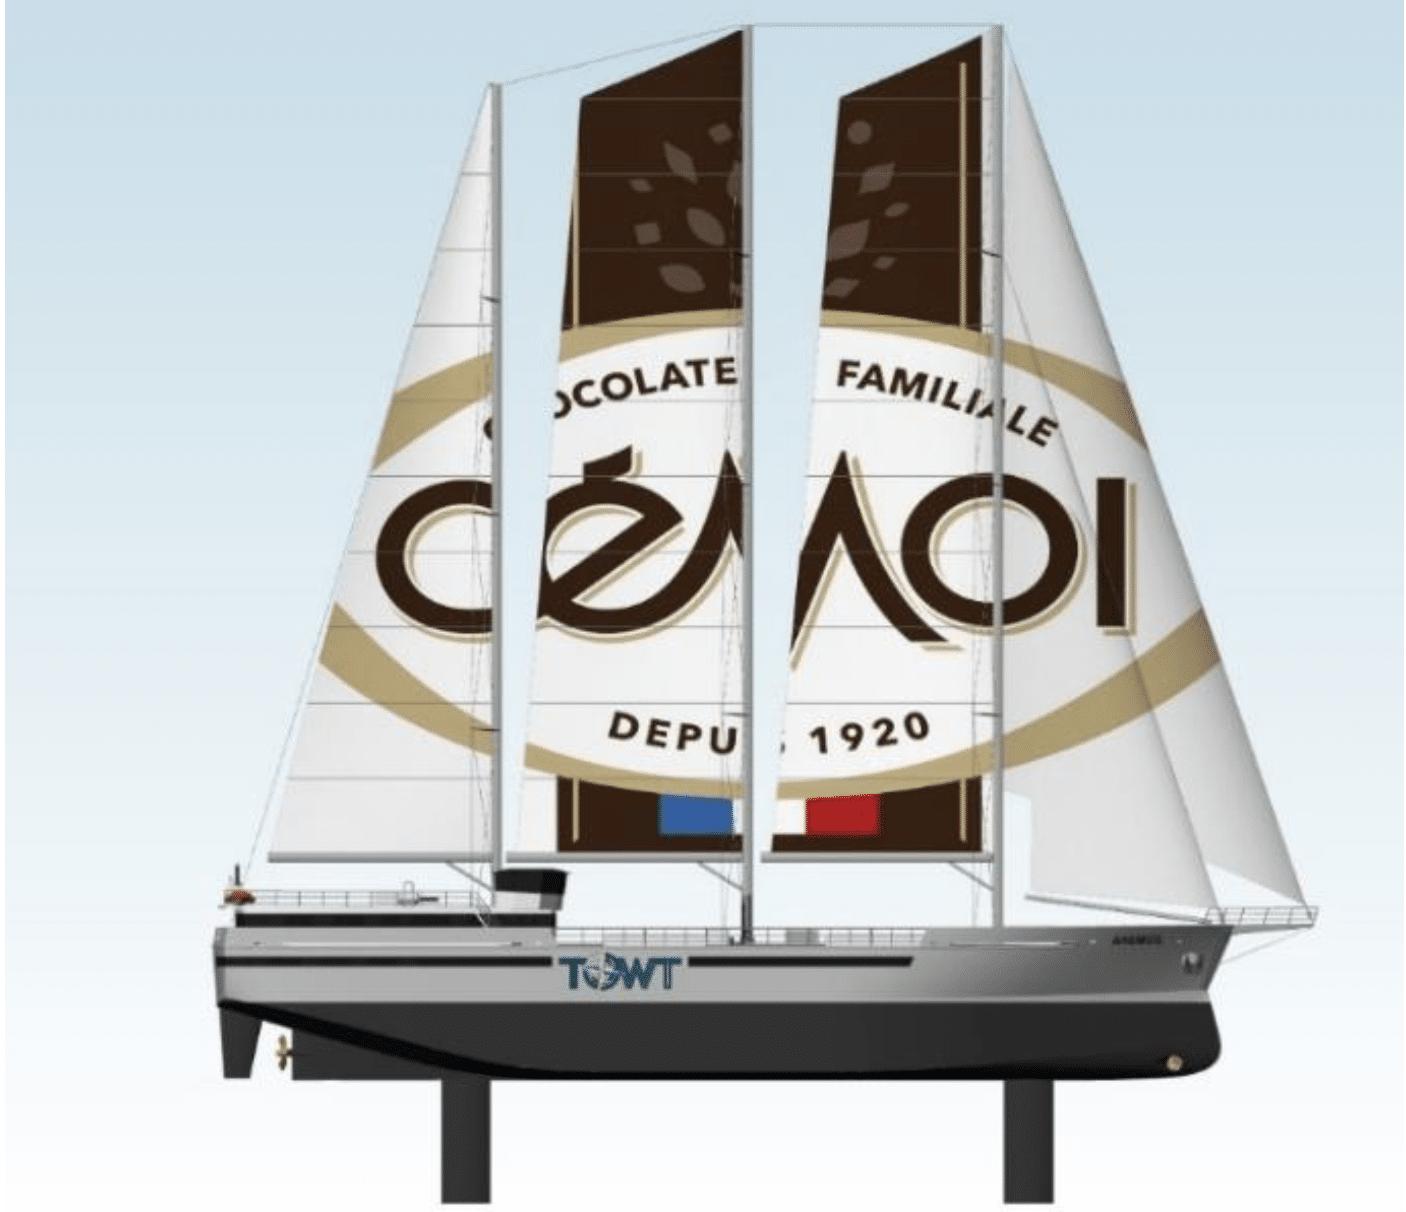 voilier-cargo-cemoi